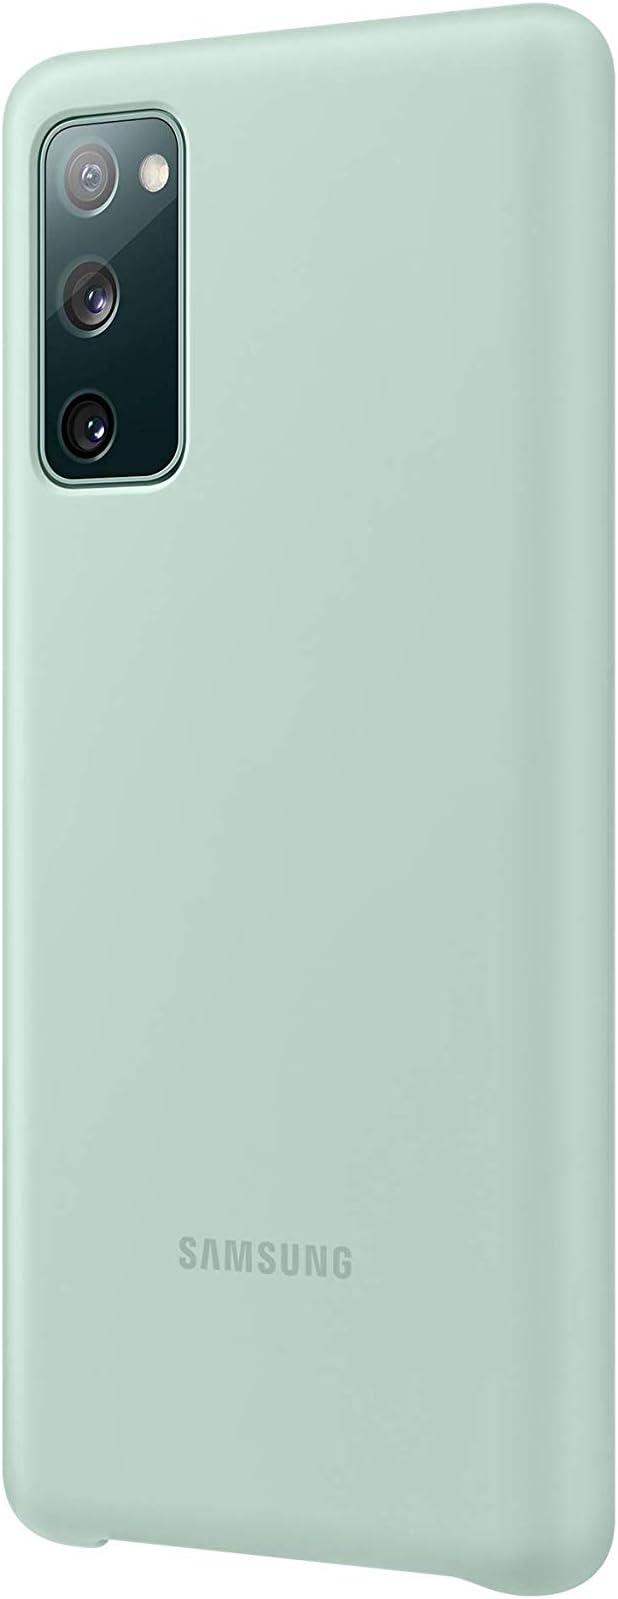 Samsung Silicone Smartphone Cover Ef Pg780 Für Galaxy S20 Fe